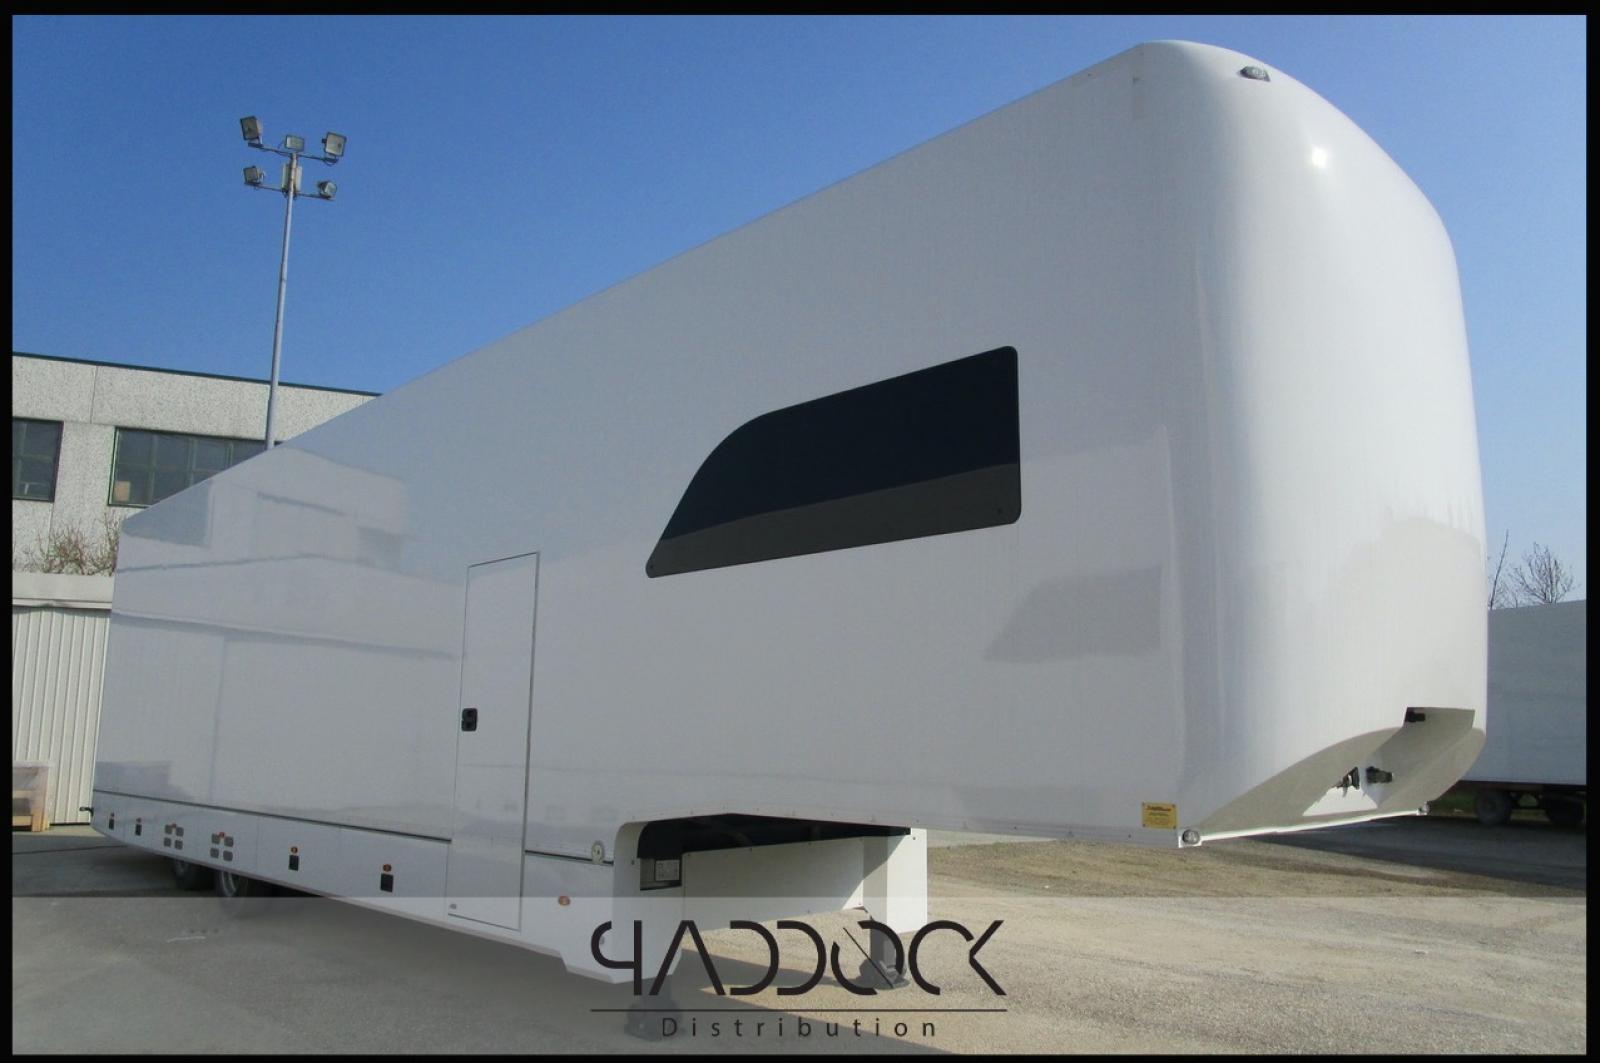 Used trailer ASTA CAR model Z2 by PADDOCK DISTRIBUTION - 1